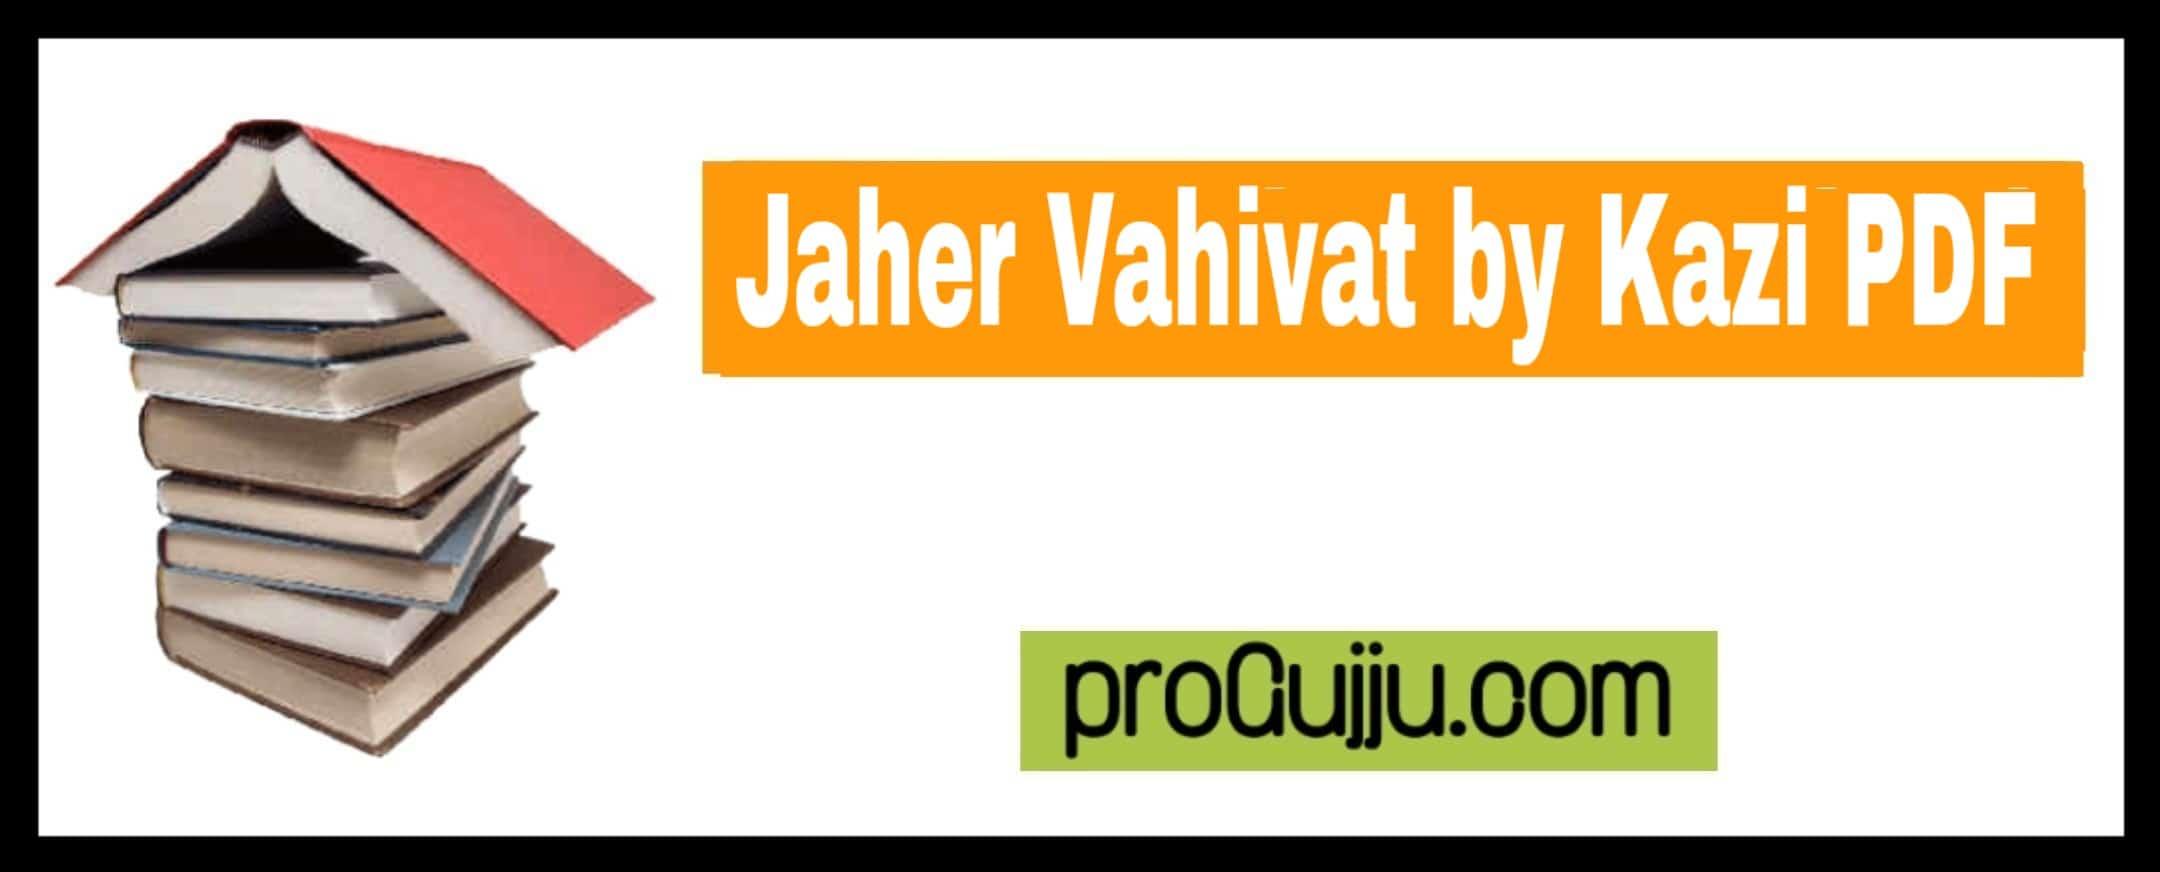 Jaher Vahivat by kazi PDF